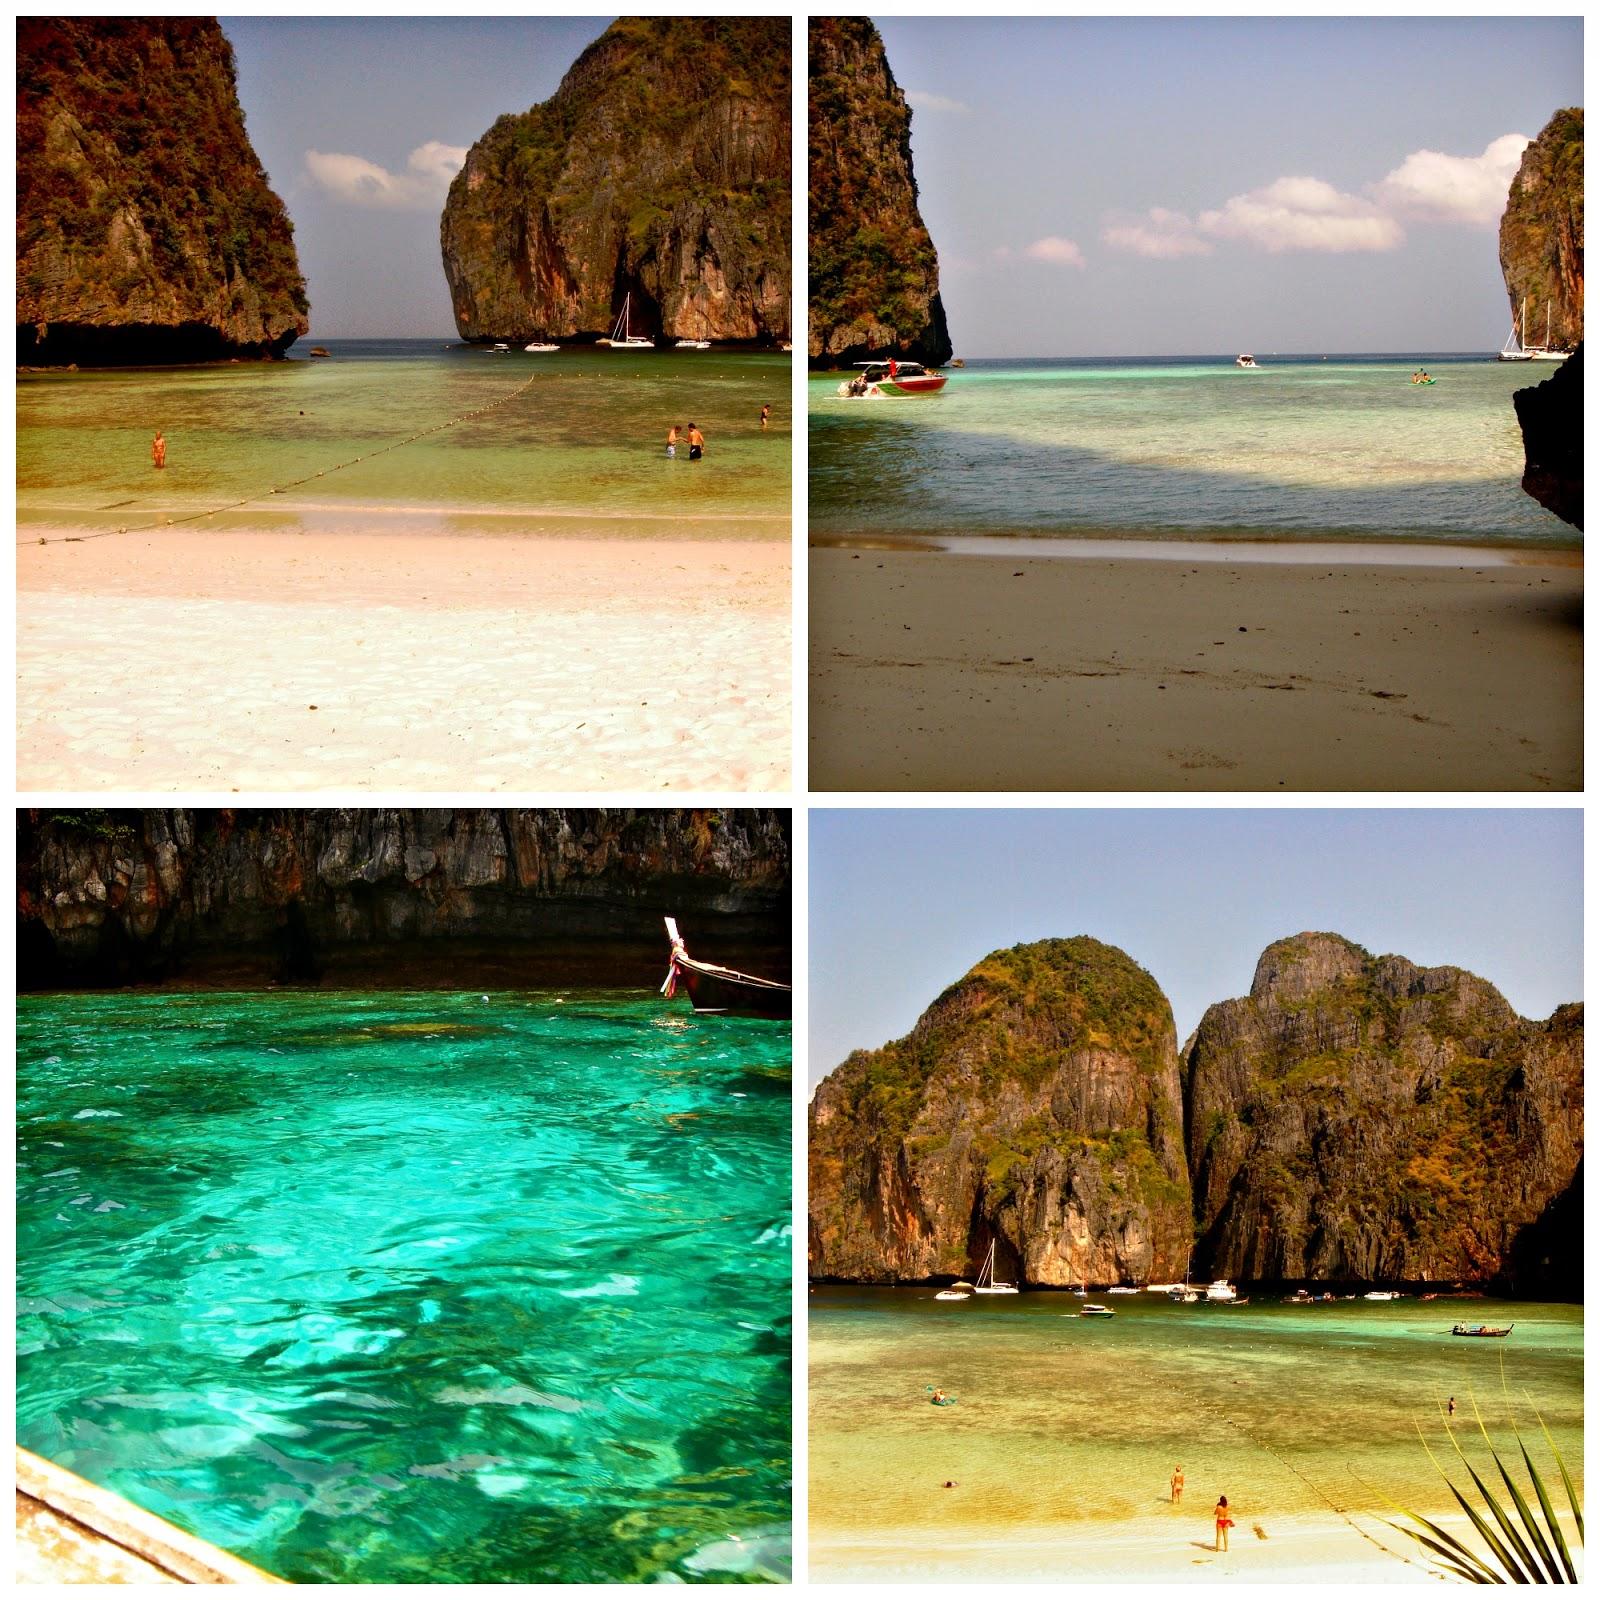 phi-phi-island-thailand-beach-asia-maya-bay